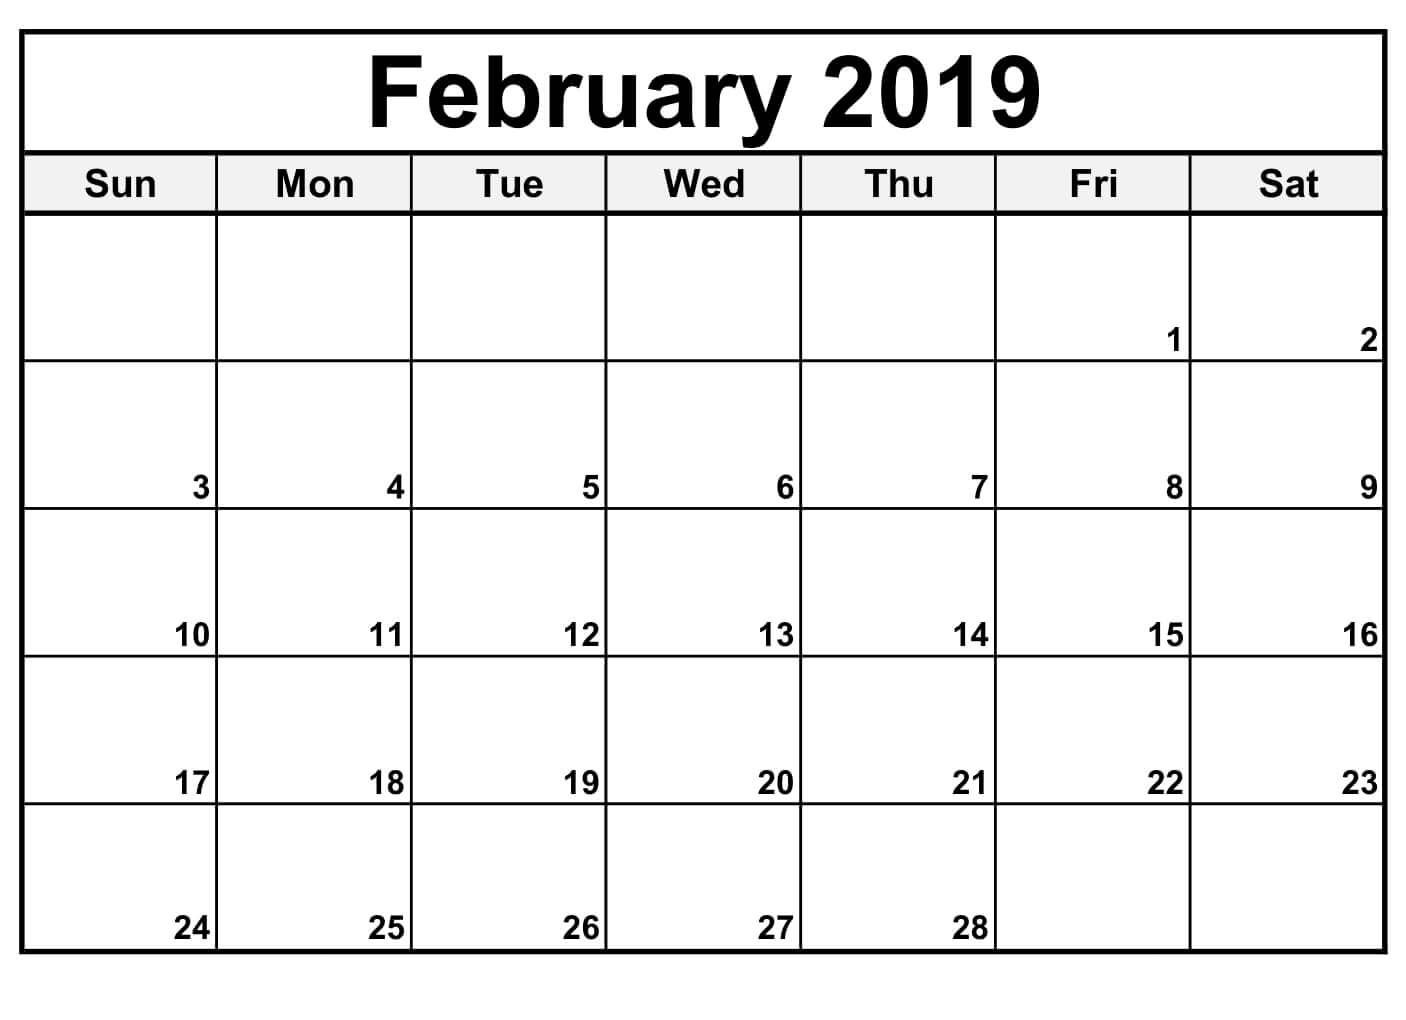 February 2019 Calendar Doc February 2019 Calendar Editable | Free Printable February 2019